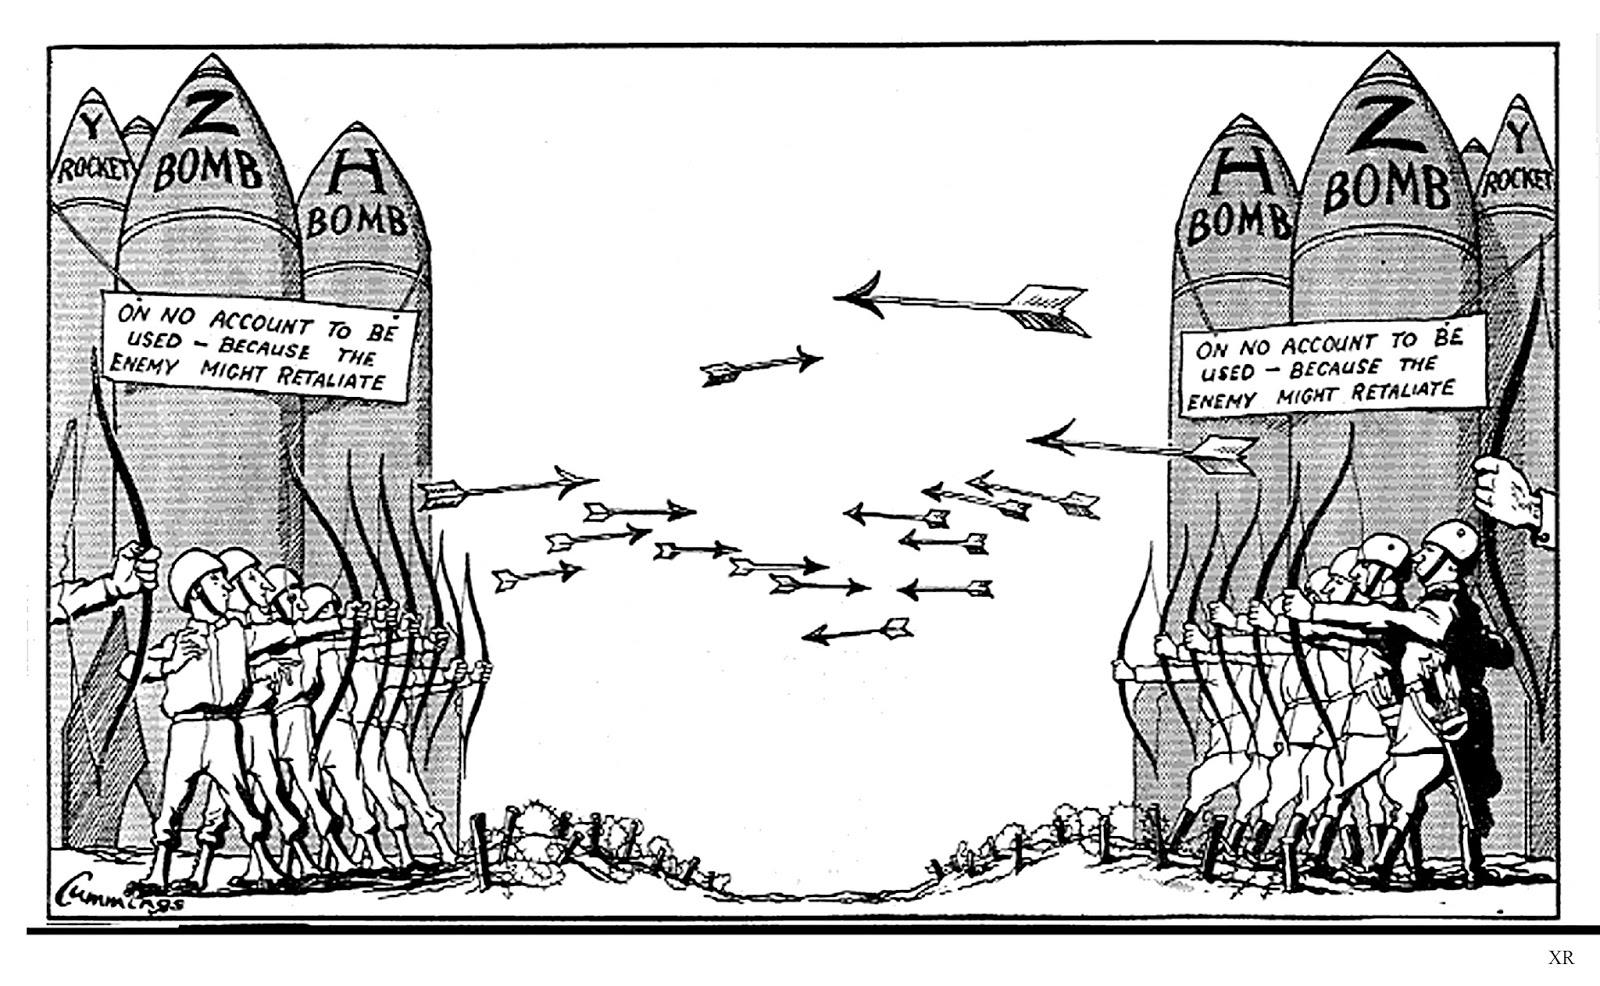 Atomic Annihilation Mutual Assured Deterrence Mad